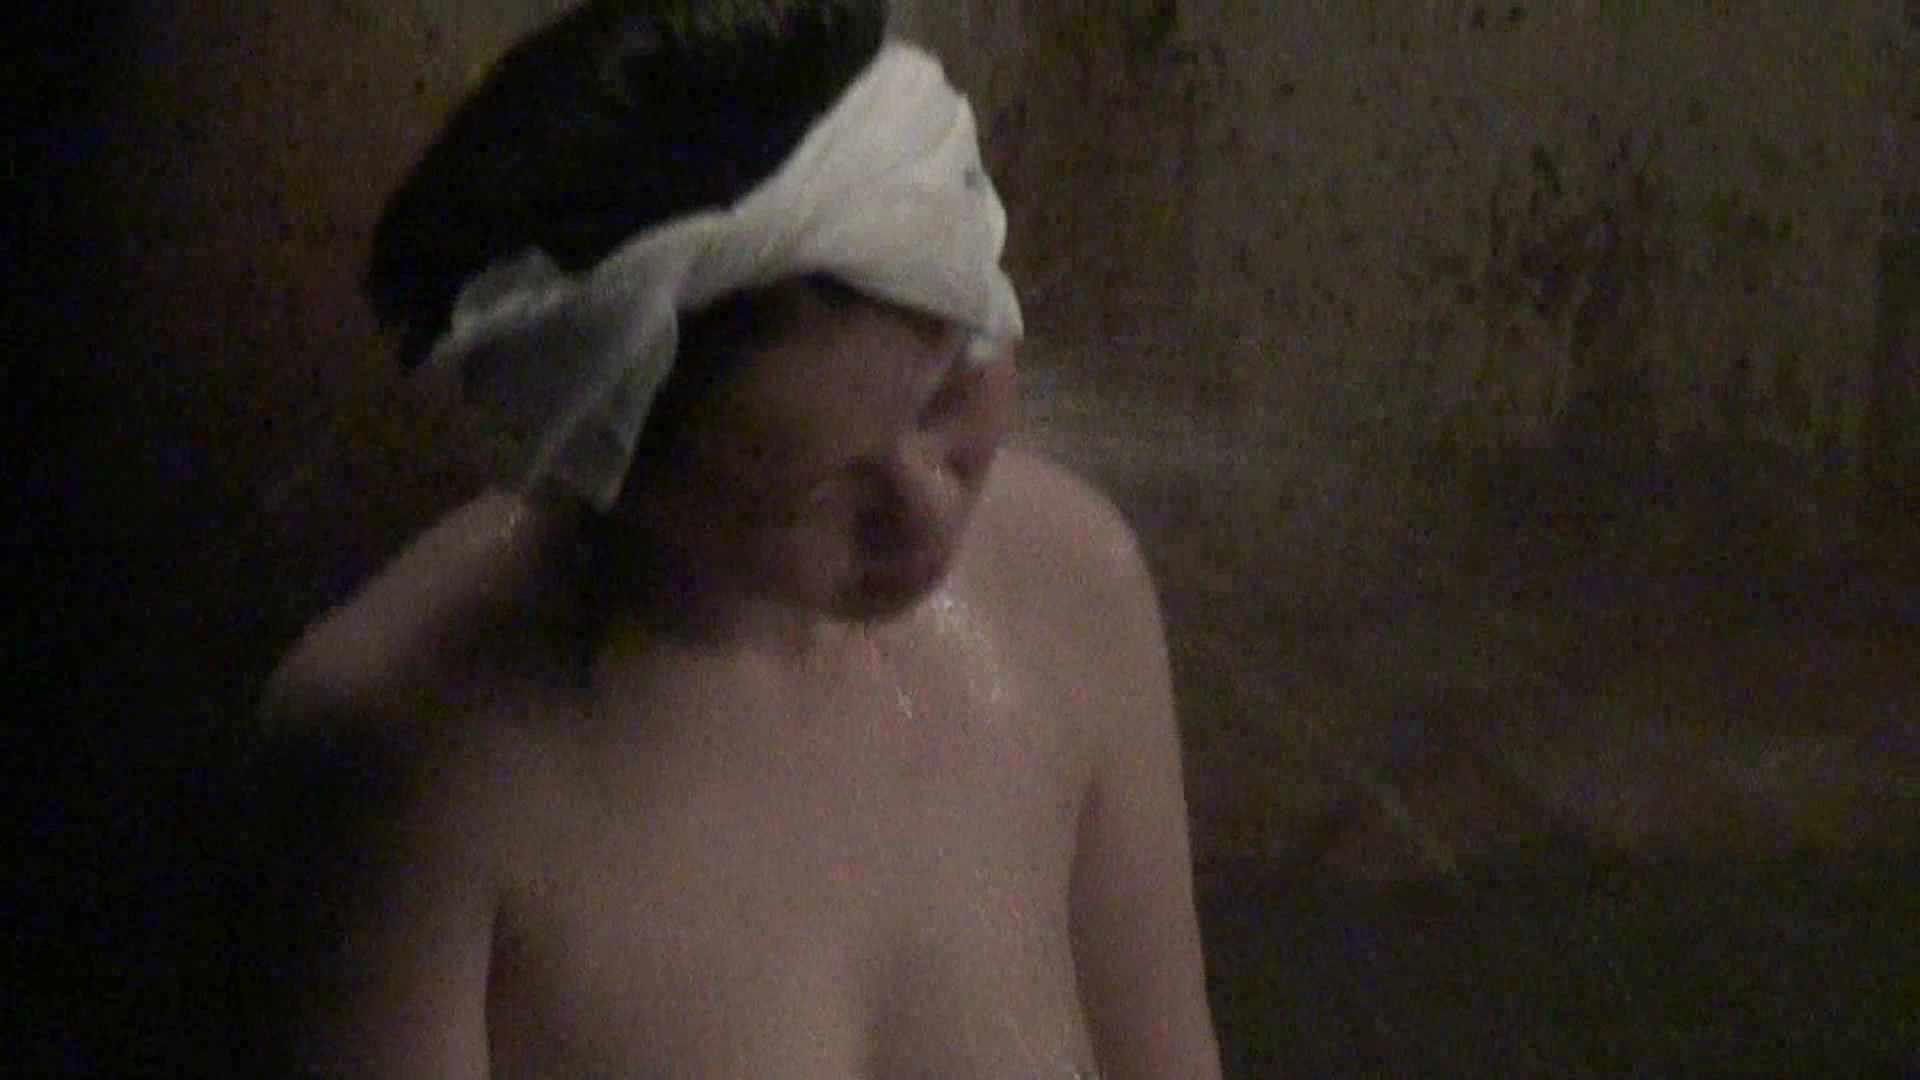 Aquaな露天風呂Vol.322 綺麗なOLたち  111枚 78